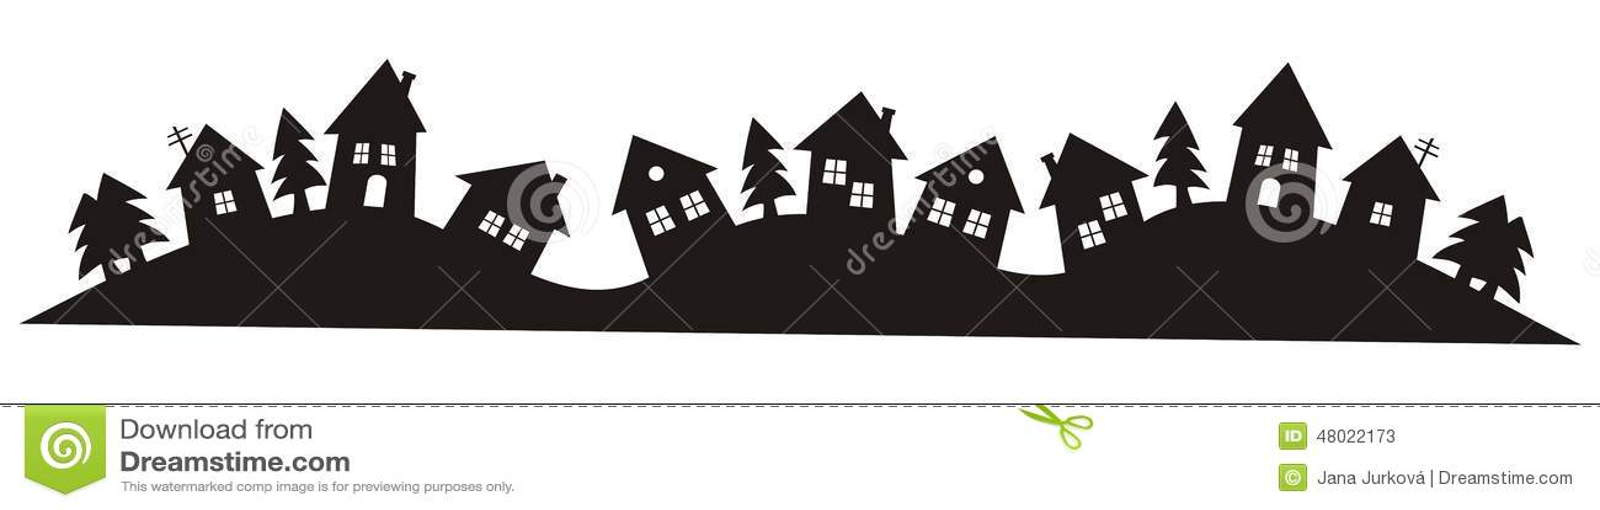 Village Black Silhouette Stock Vector Image 48022173